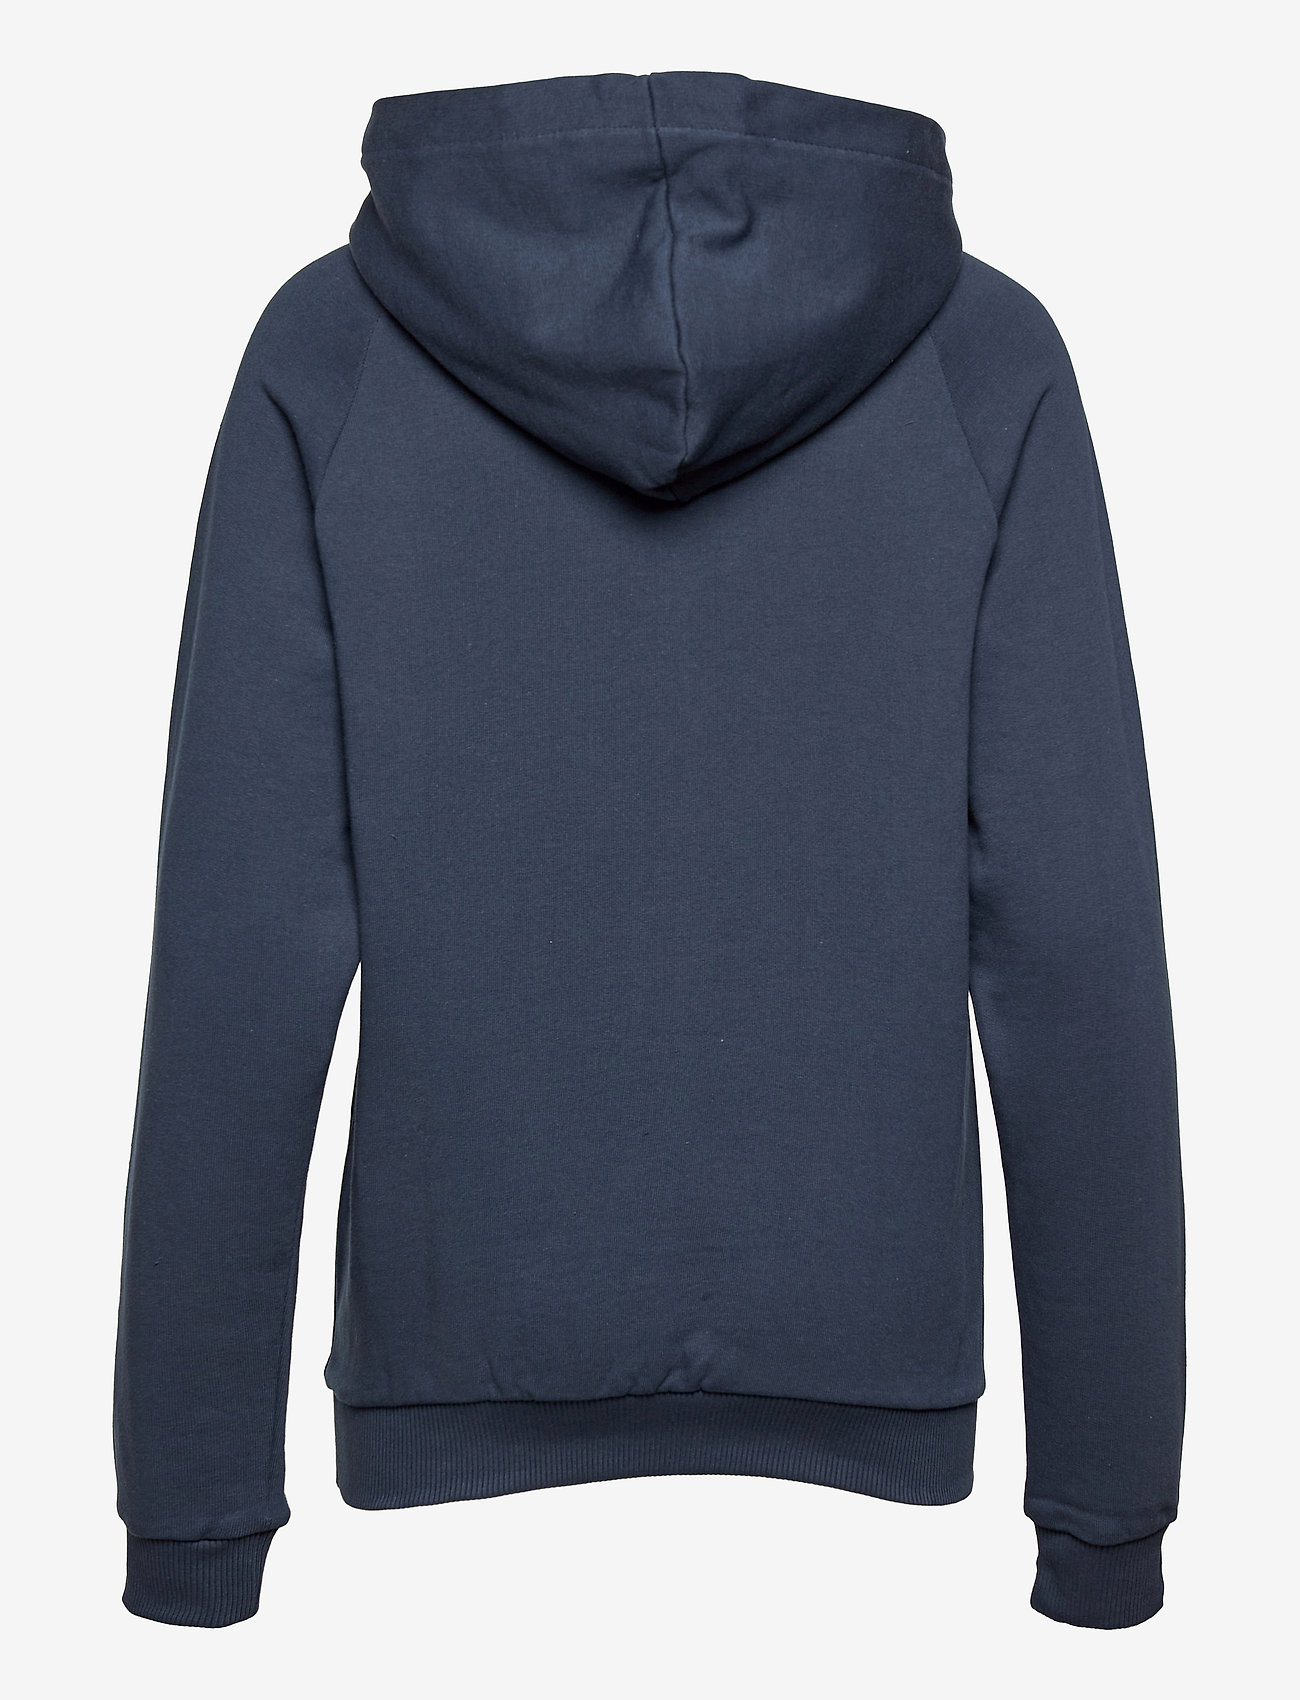 BALL - BALL RIMINI HOODIE - sweatshirts & hættetrøjer - navy - 1